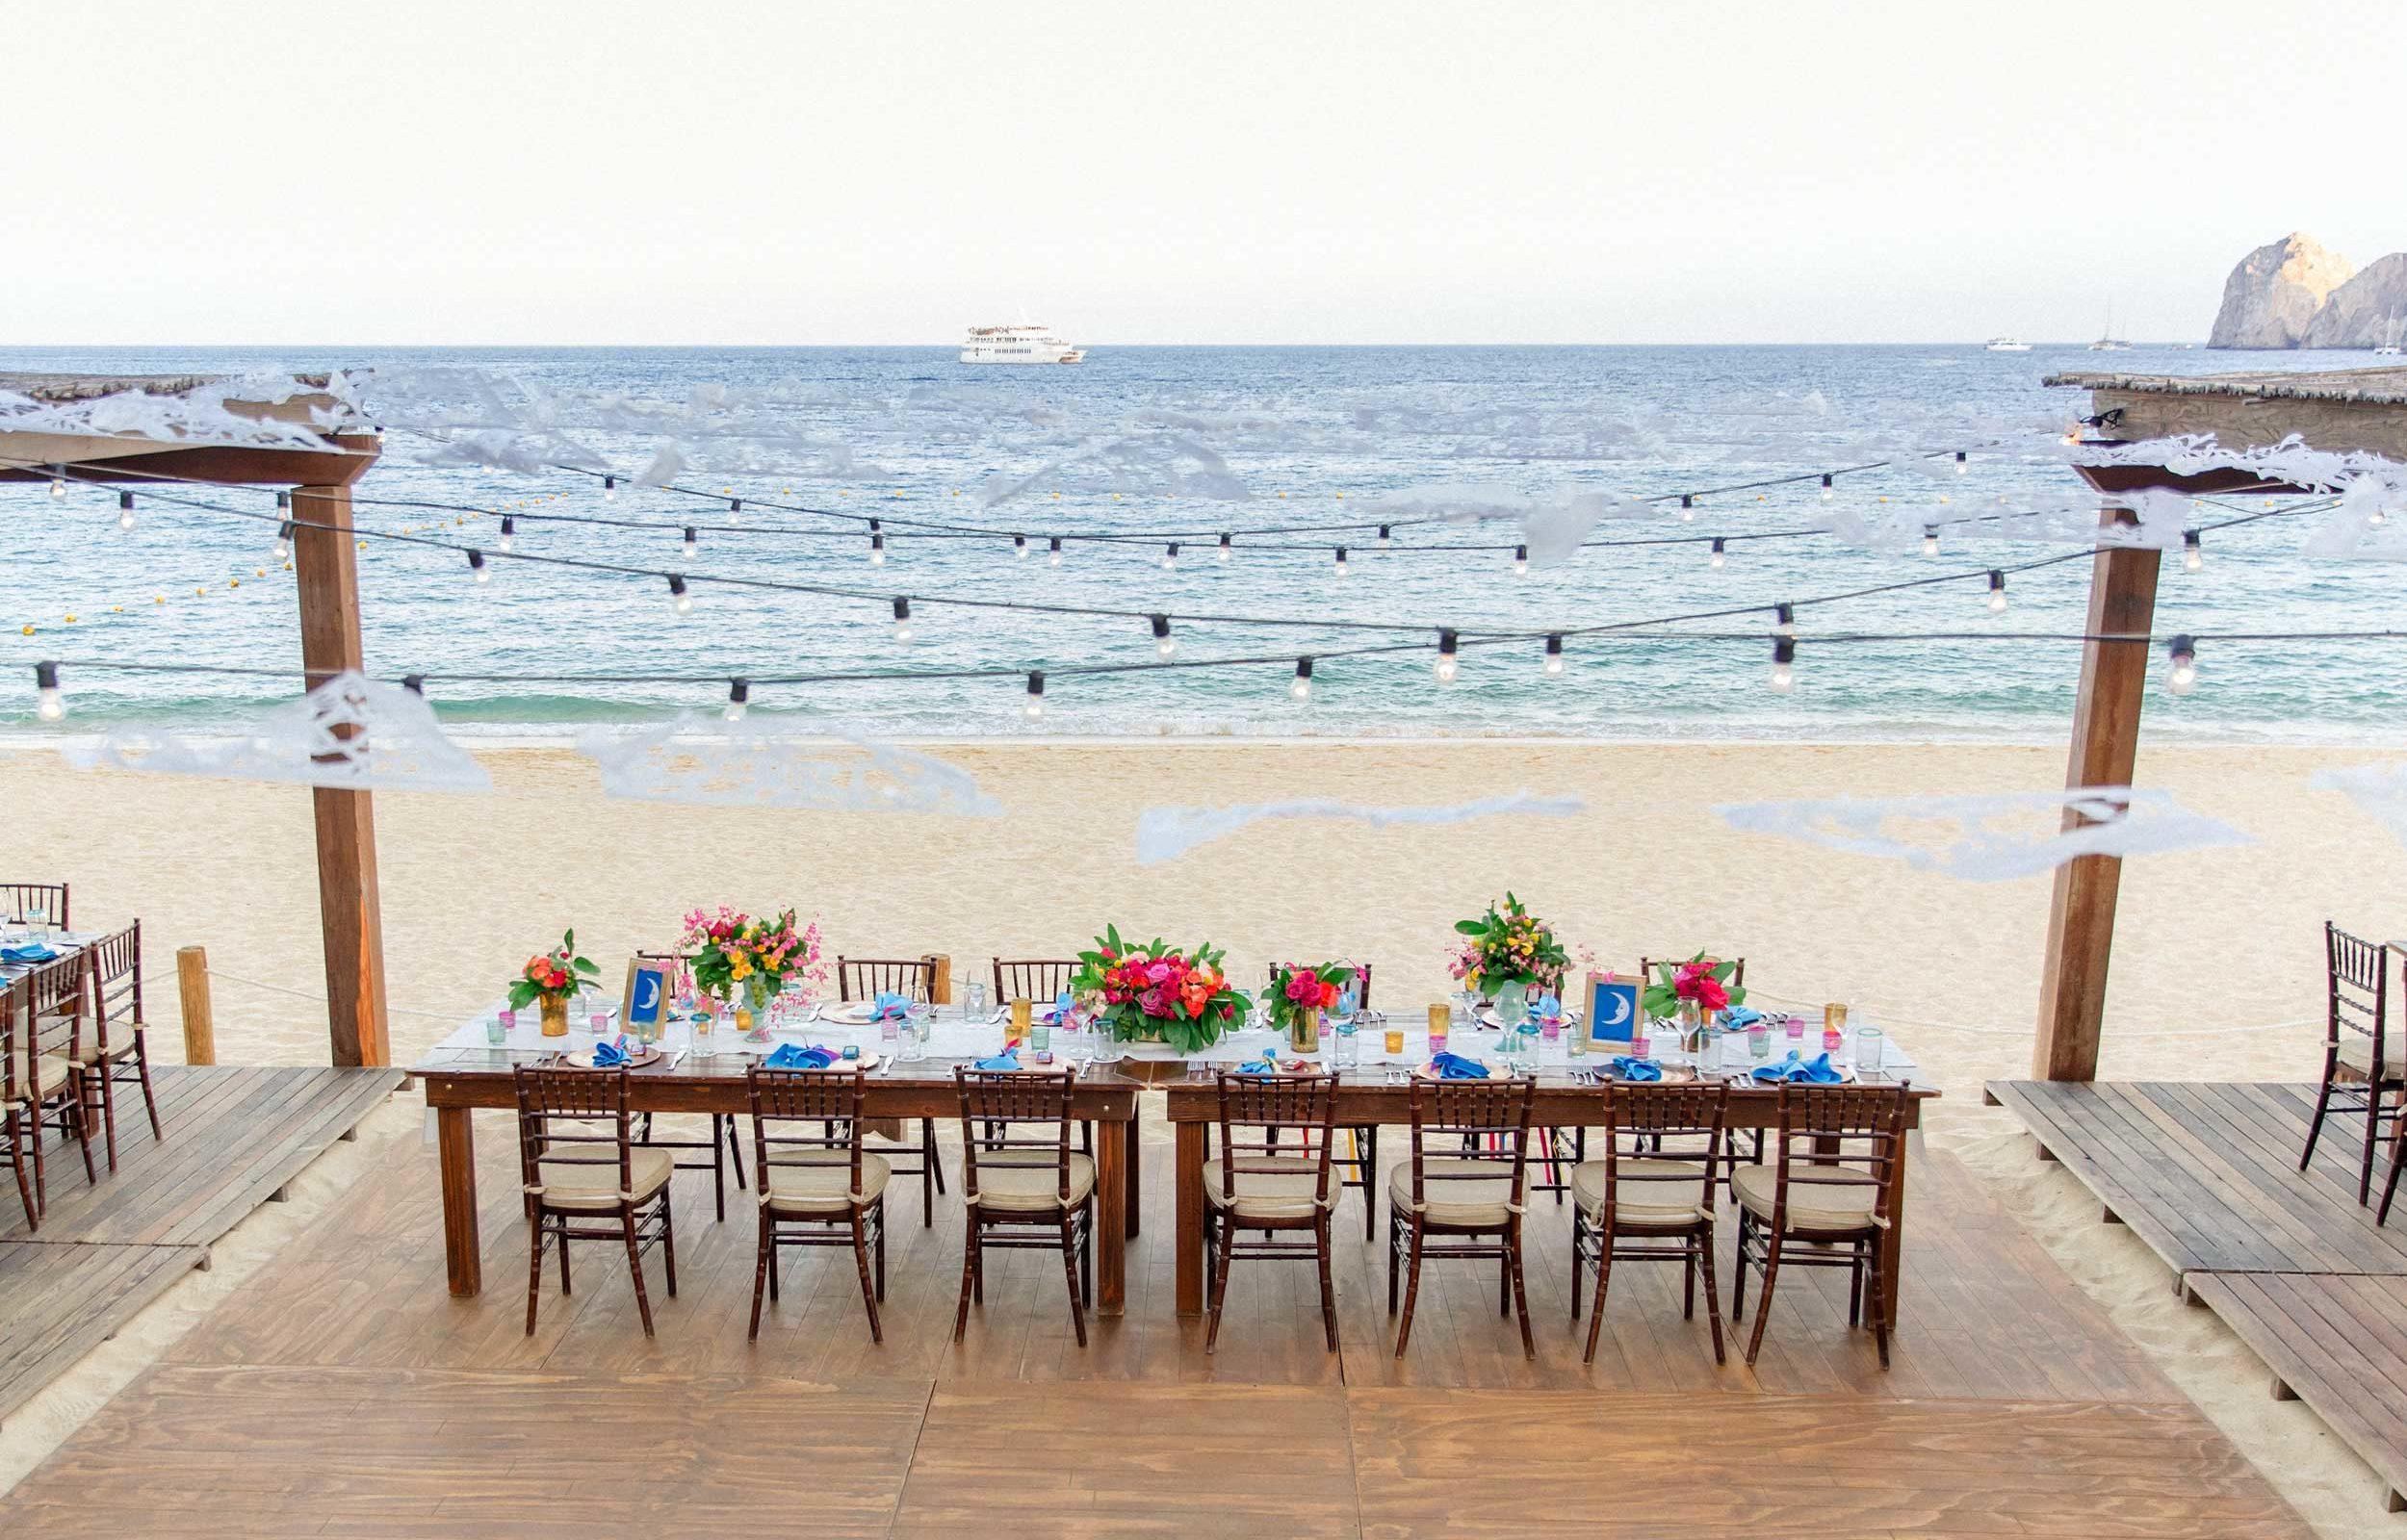 MEDANO BEACH PERGOLAS